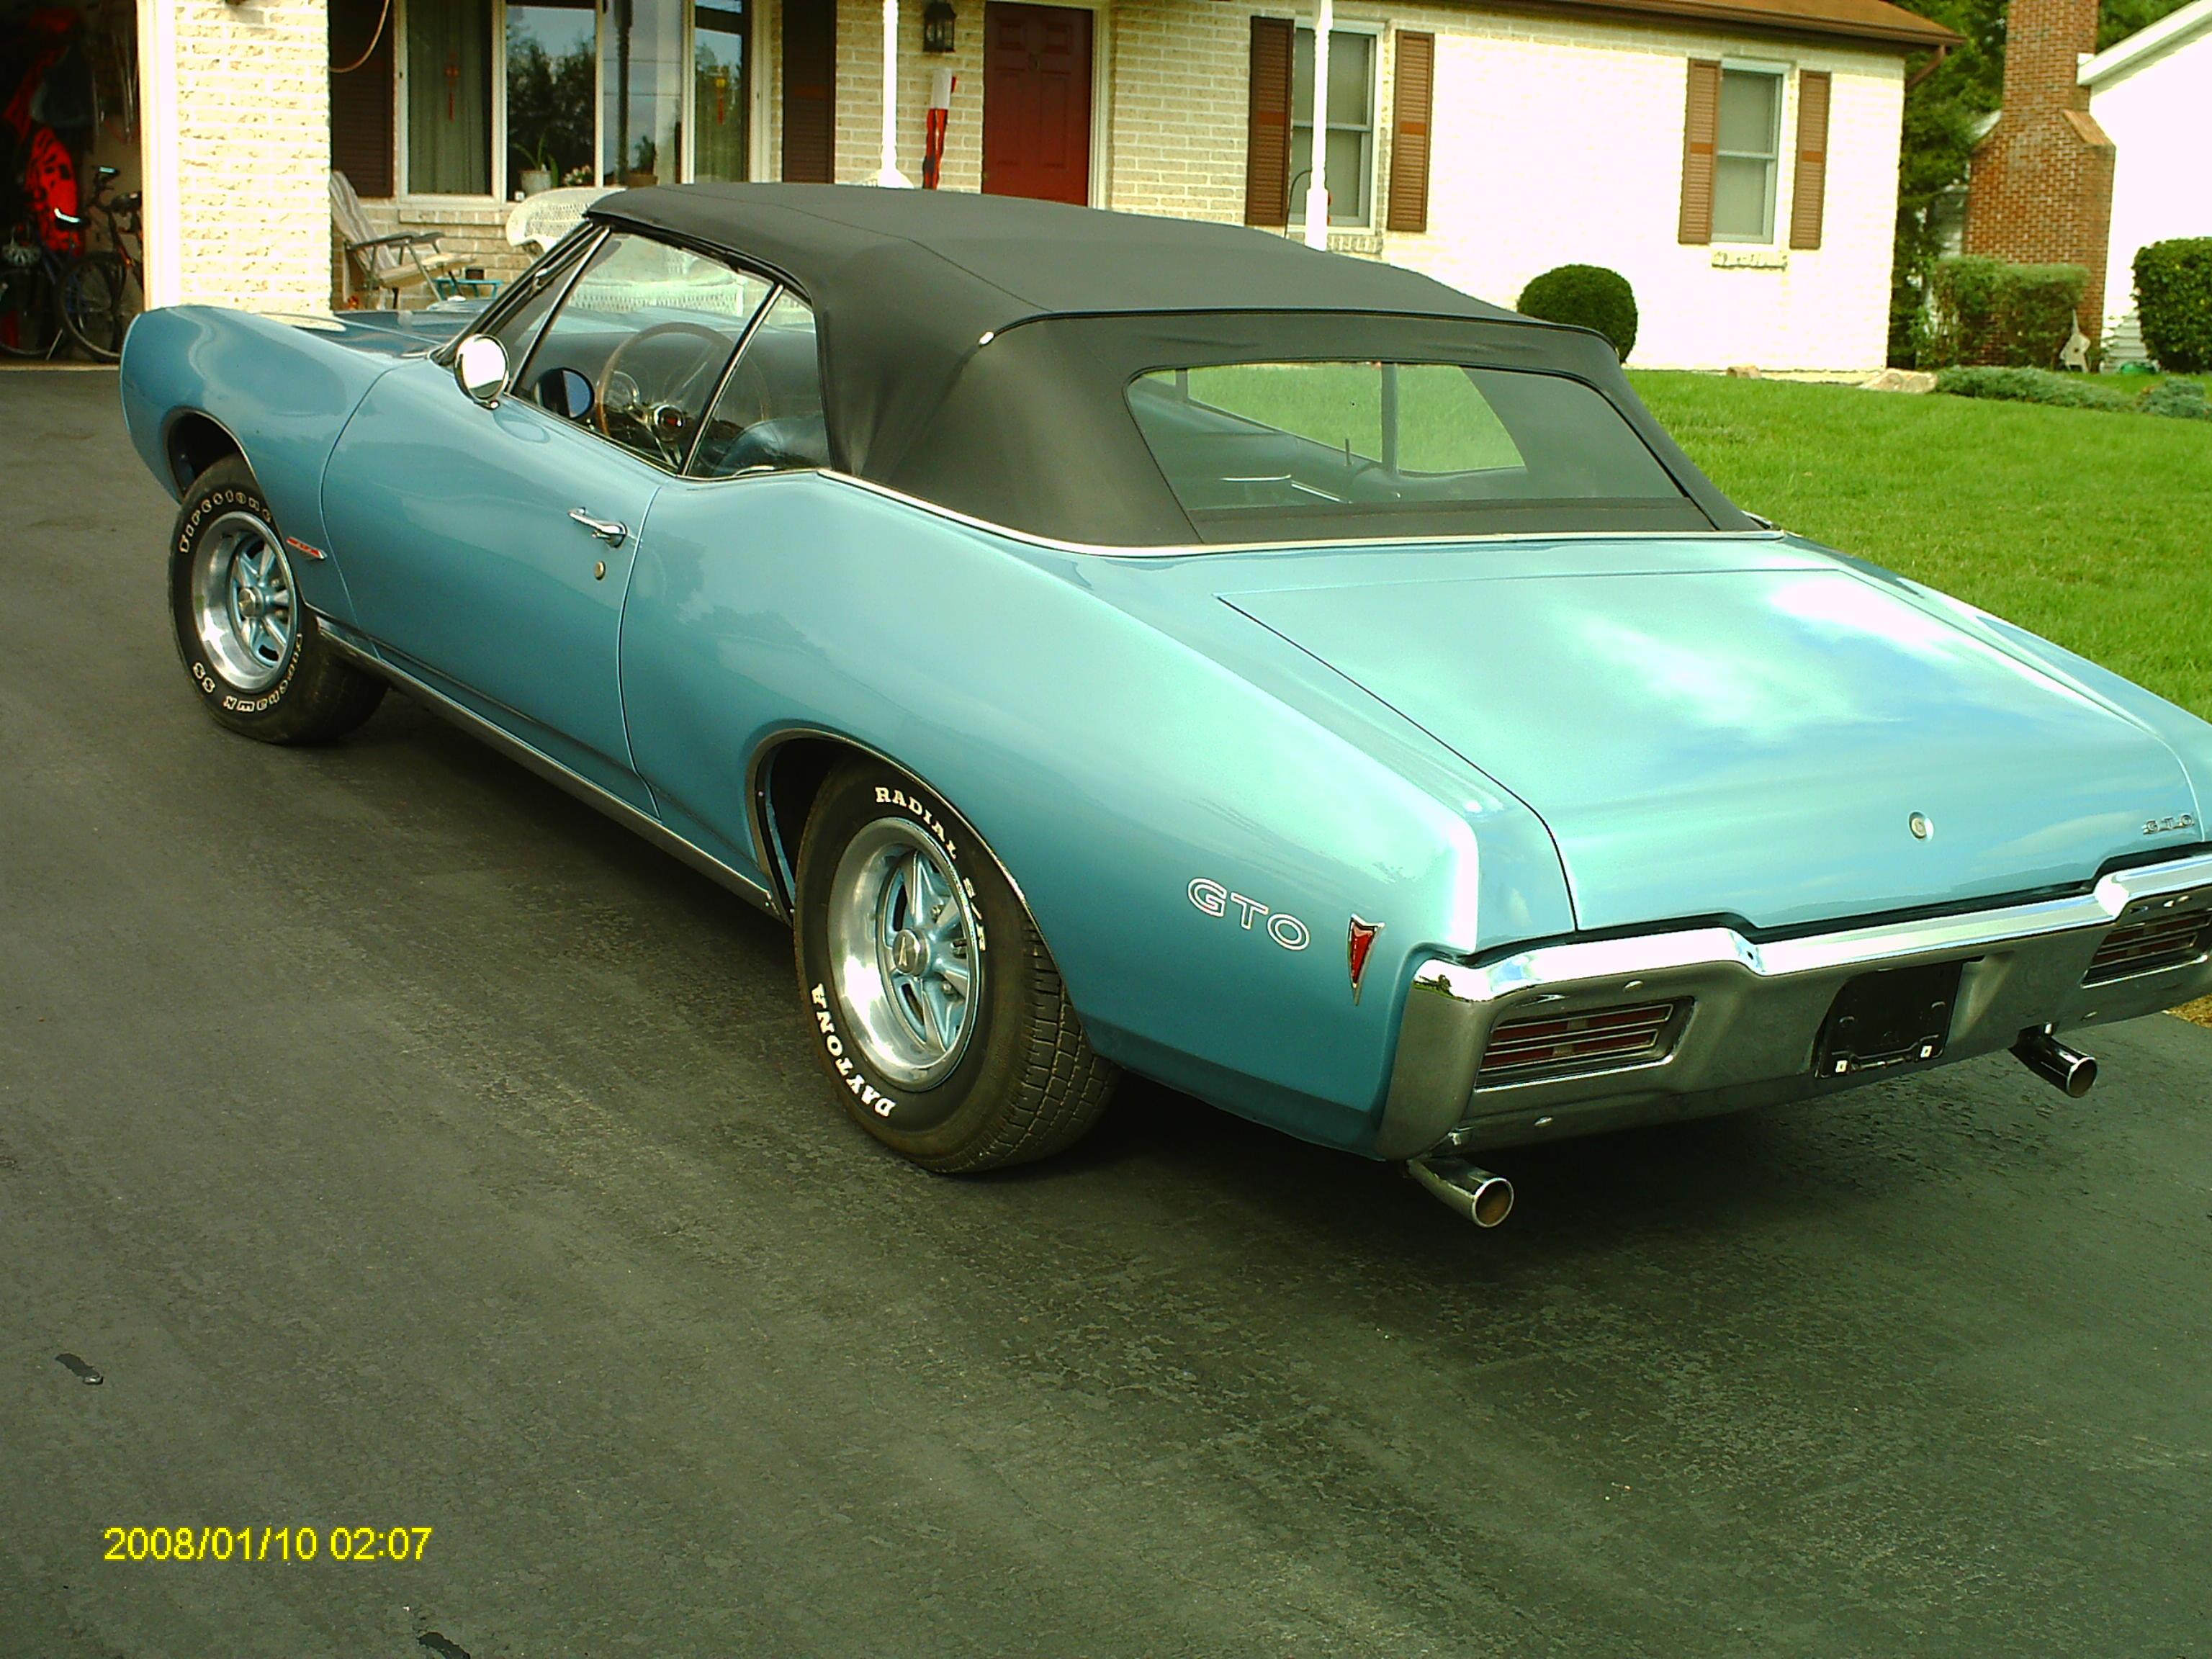 Fully Restored 1968 Pontiac GTO Convertible-1968-gto-convertible001.jpg